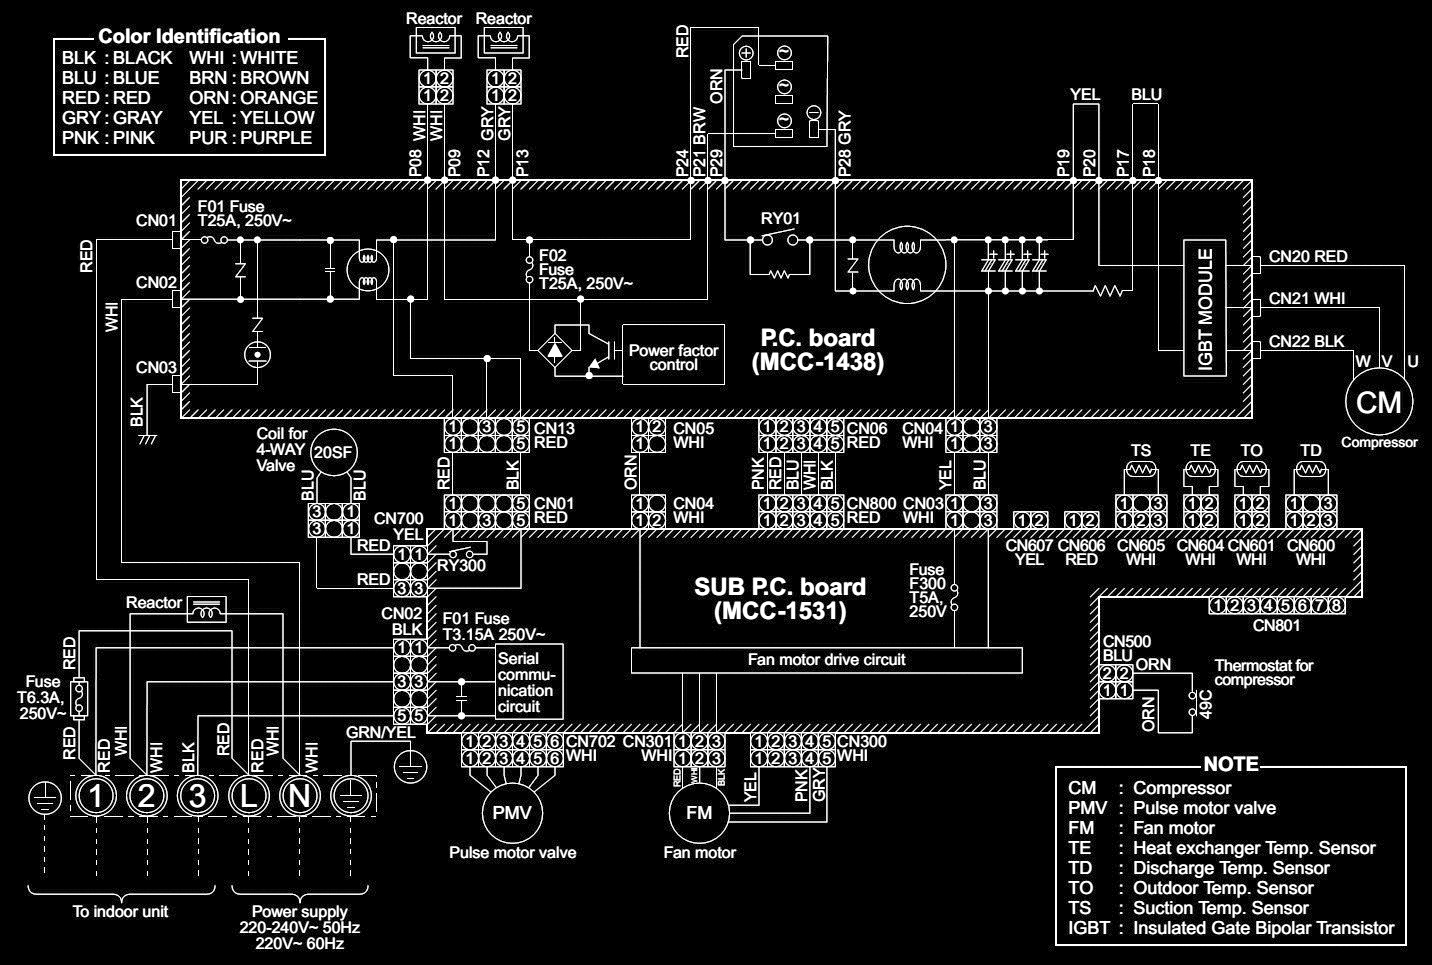 medium resolution of toshiba air conditioner wiring diagram conditioner wiring diagram toshiba split air conditioner ravsm562at ravsm1402at